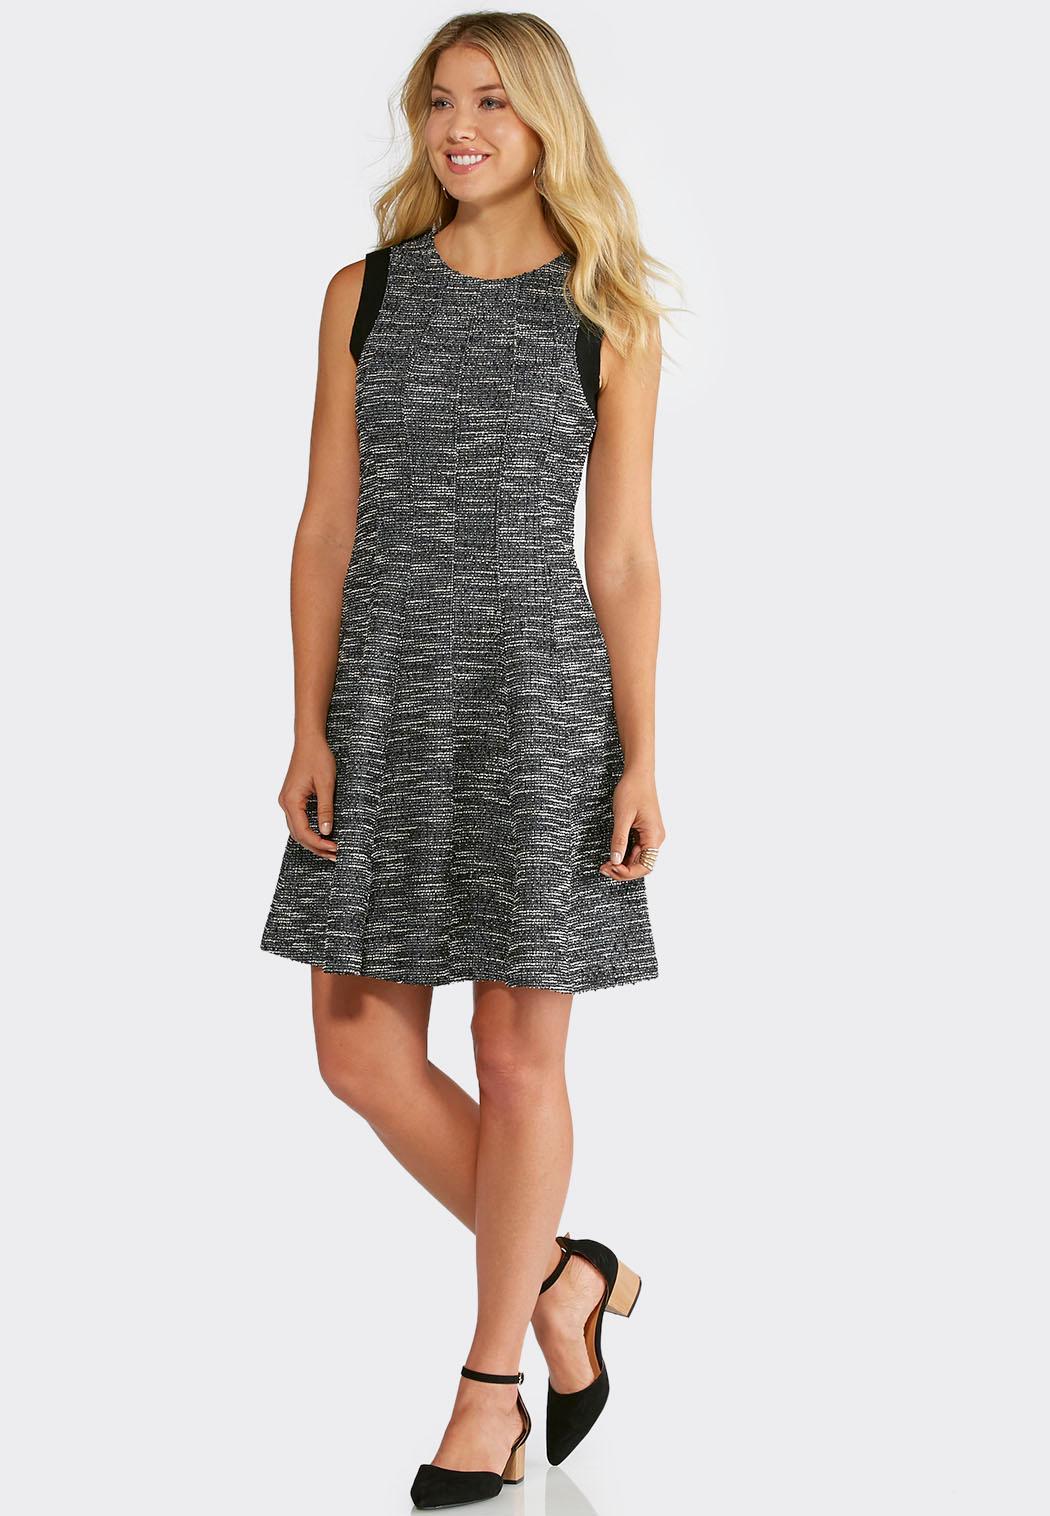 one piece dress for plus size image collections - dresses design ideas